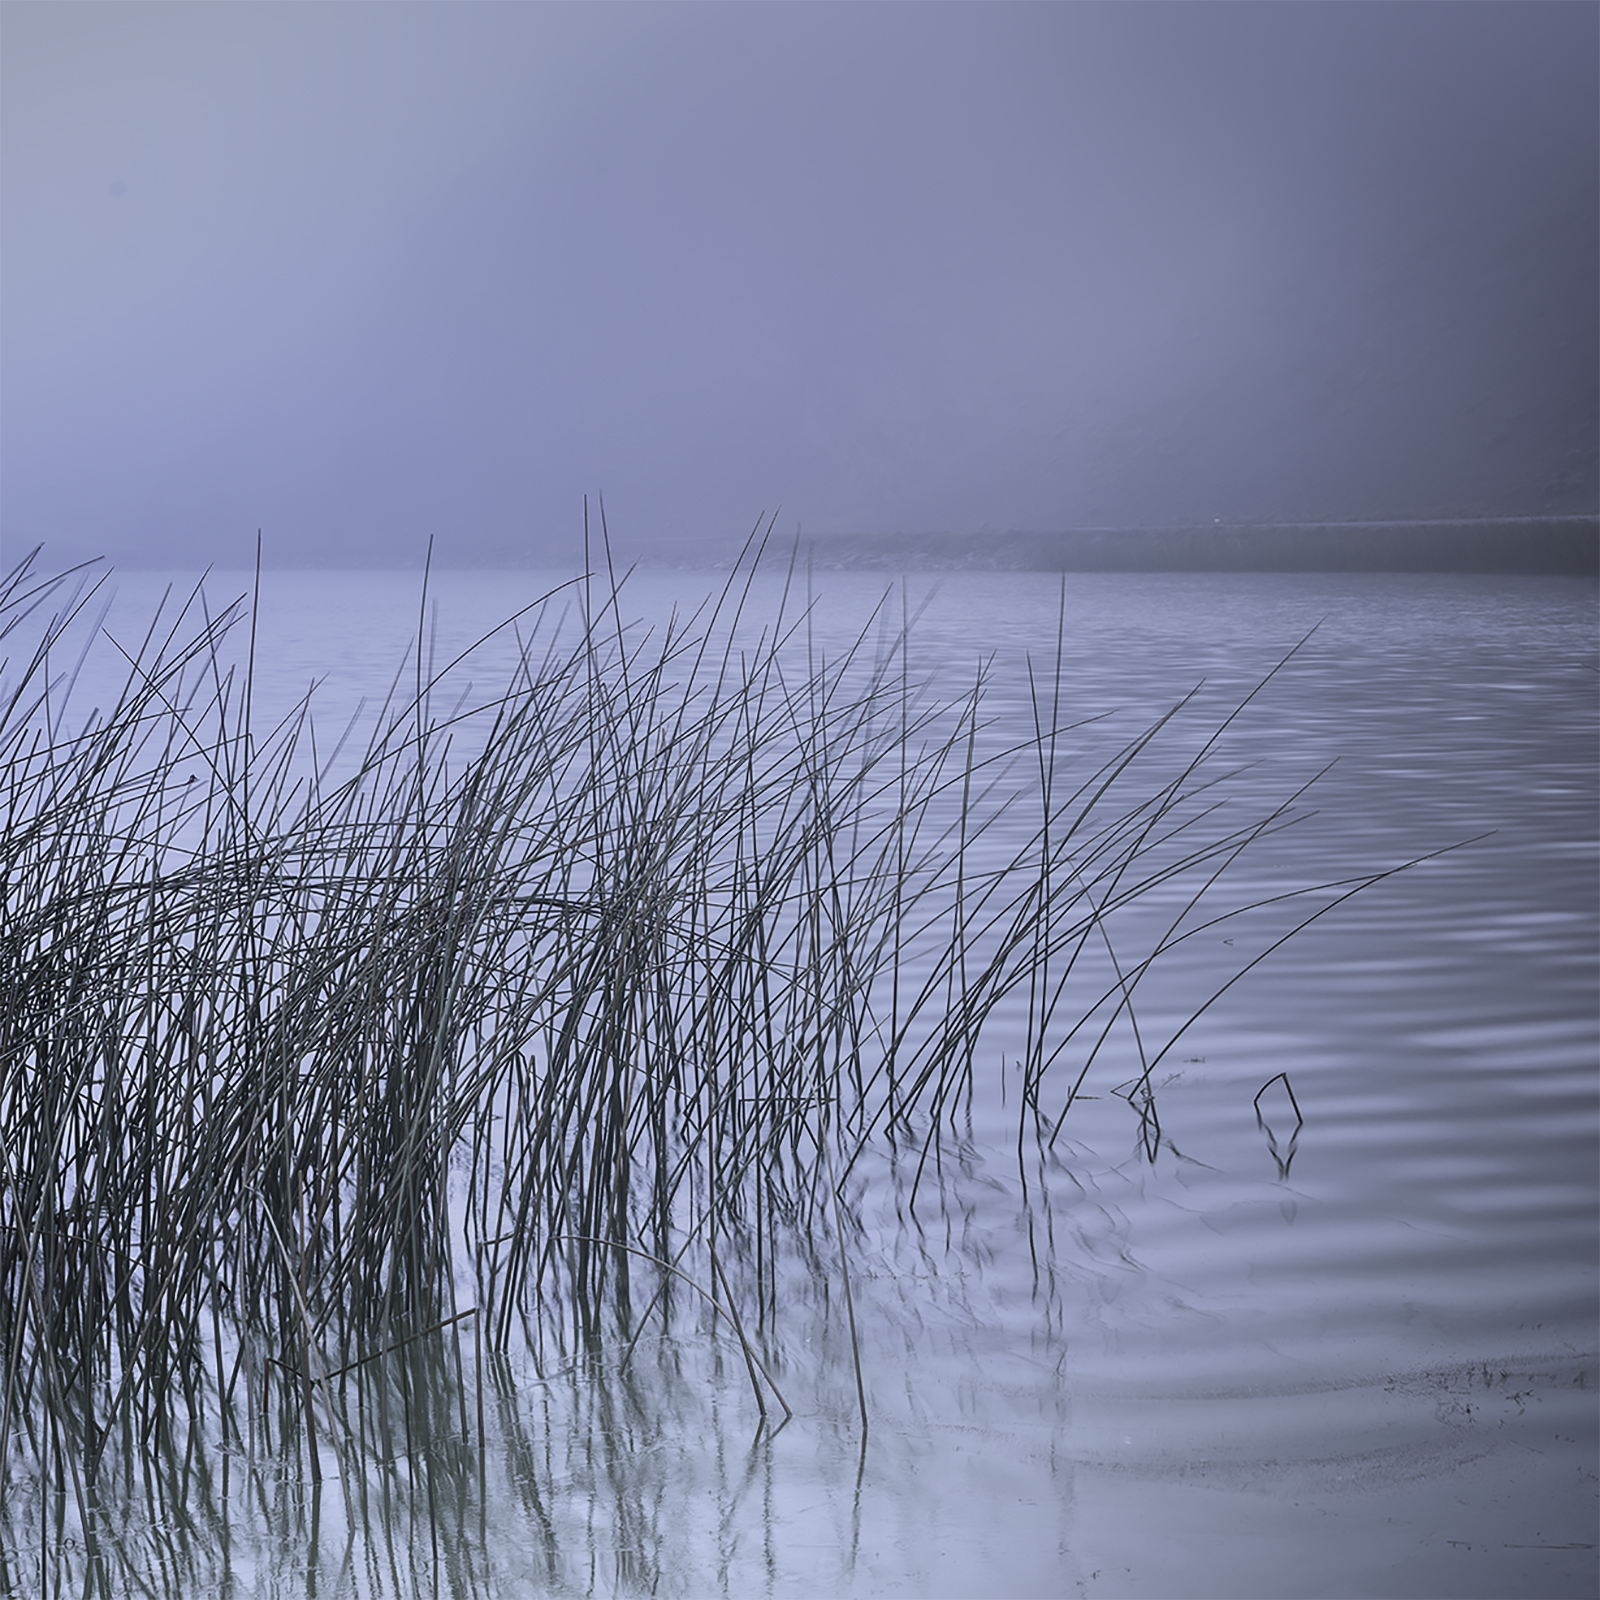 Reeds, study#3 - Torres del Paine, Patagonia